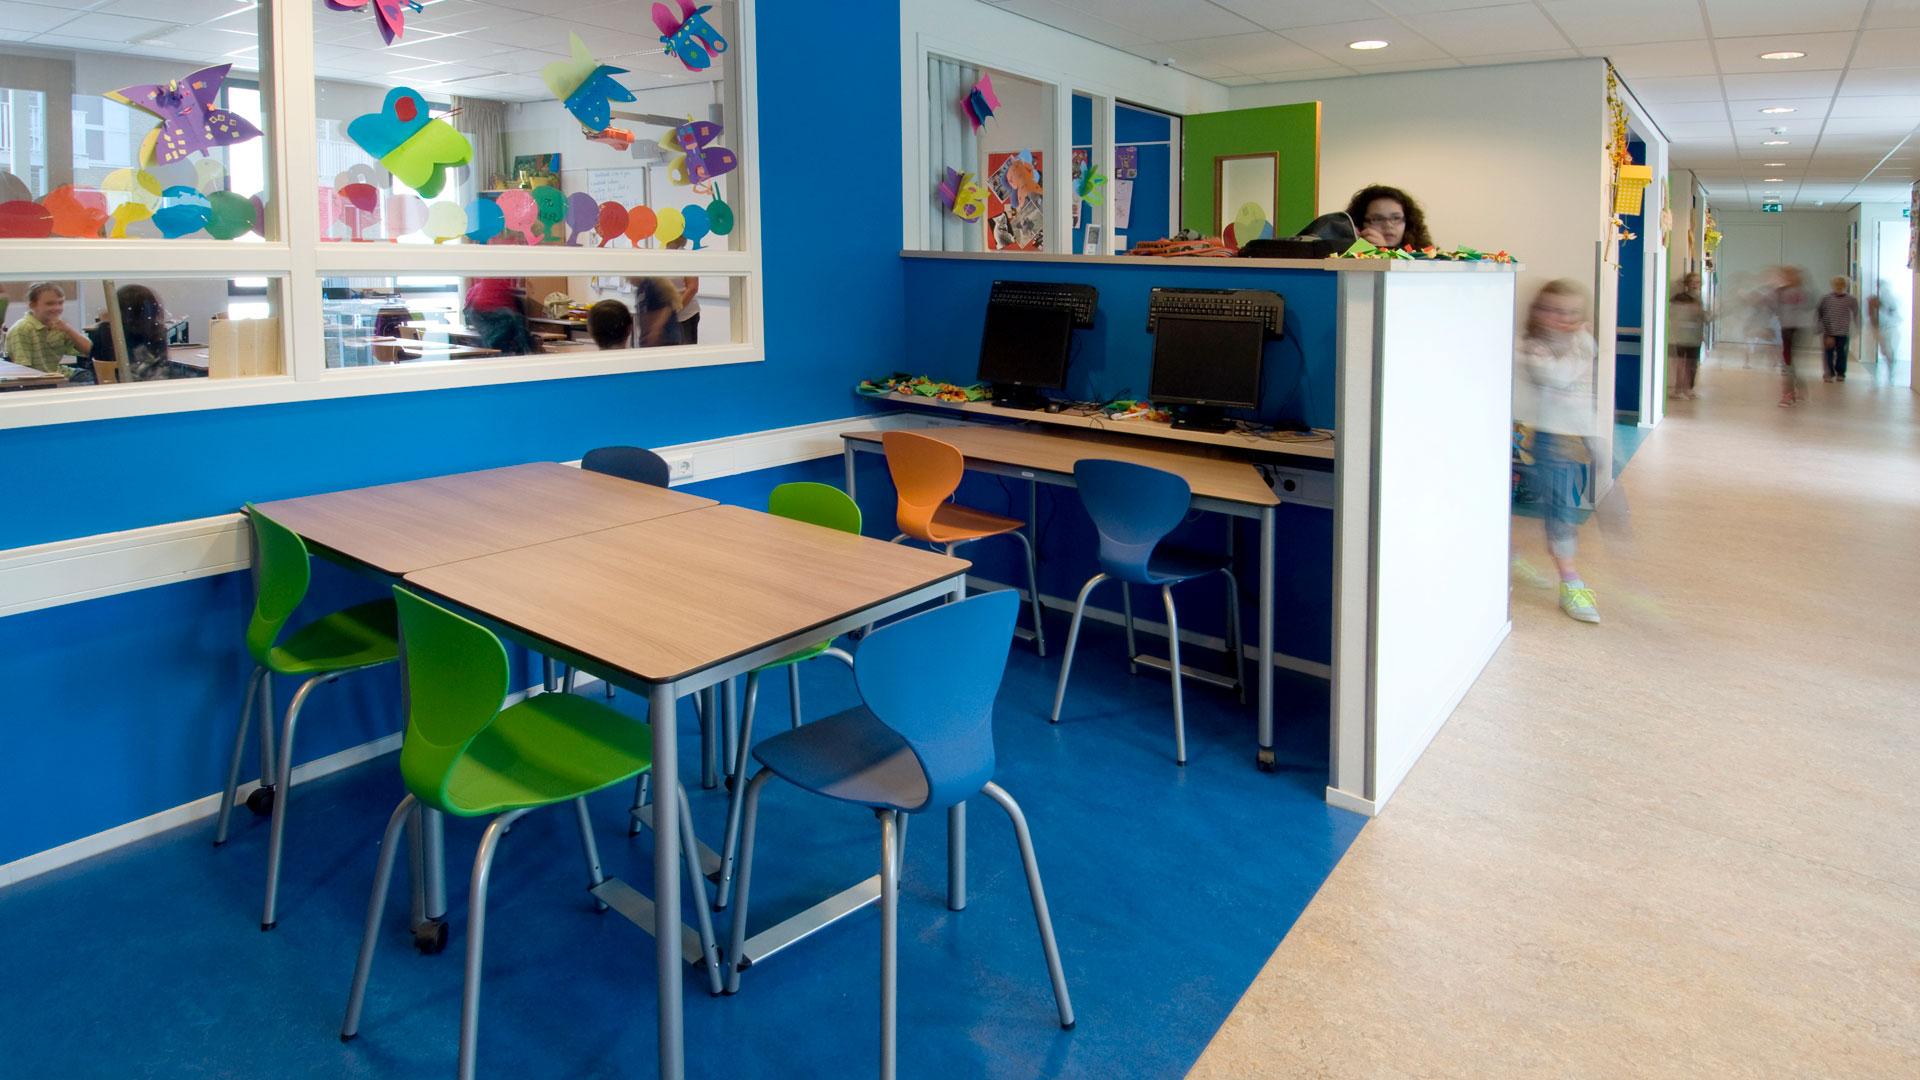 https://www.bureaubos.nl/wp-content/uploads/2017/12/4312-Zandvoort-LDC-interieur-werkplek-op-de-gang-web.jpg